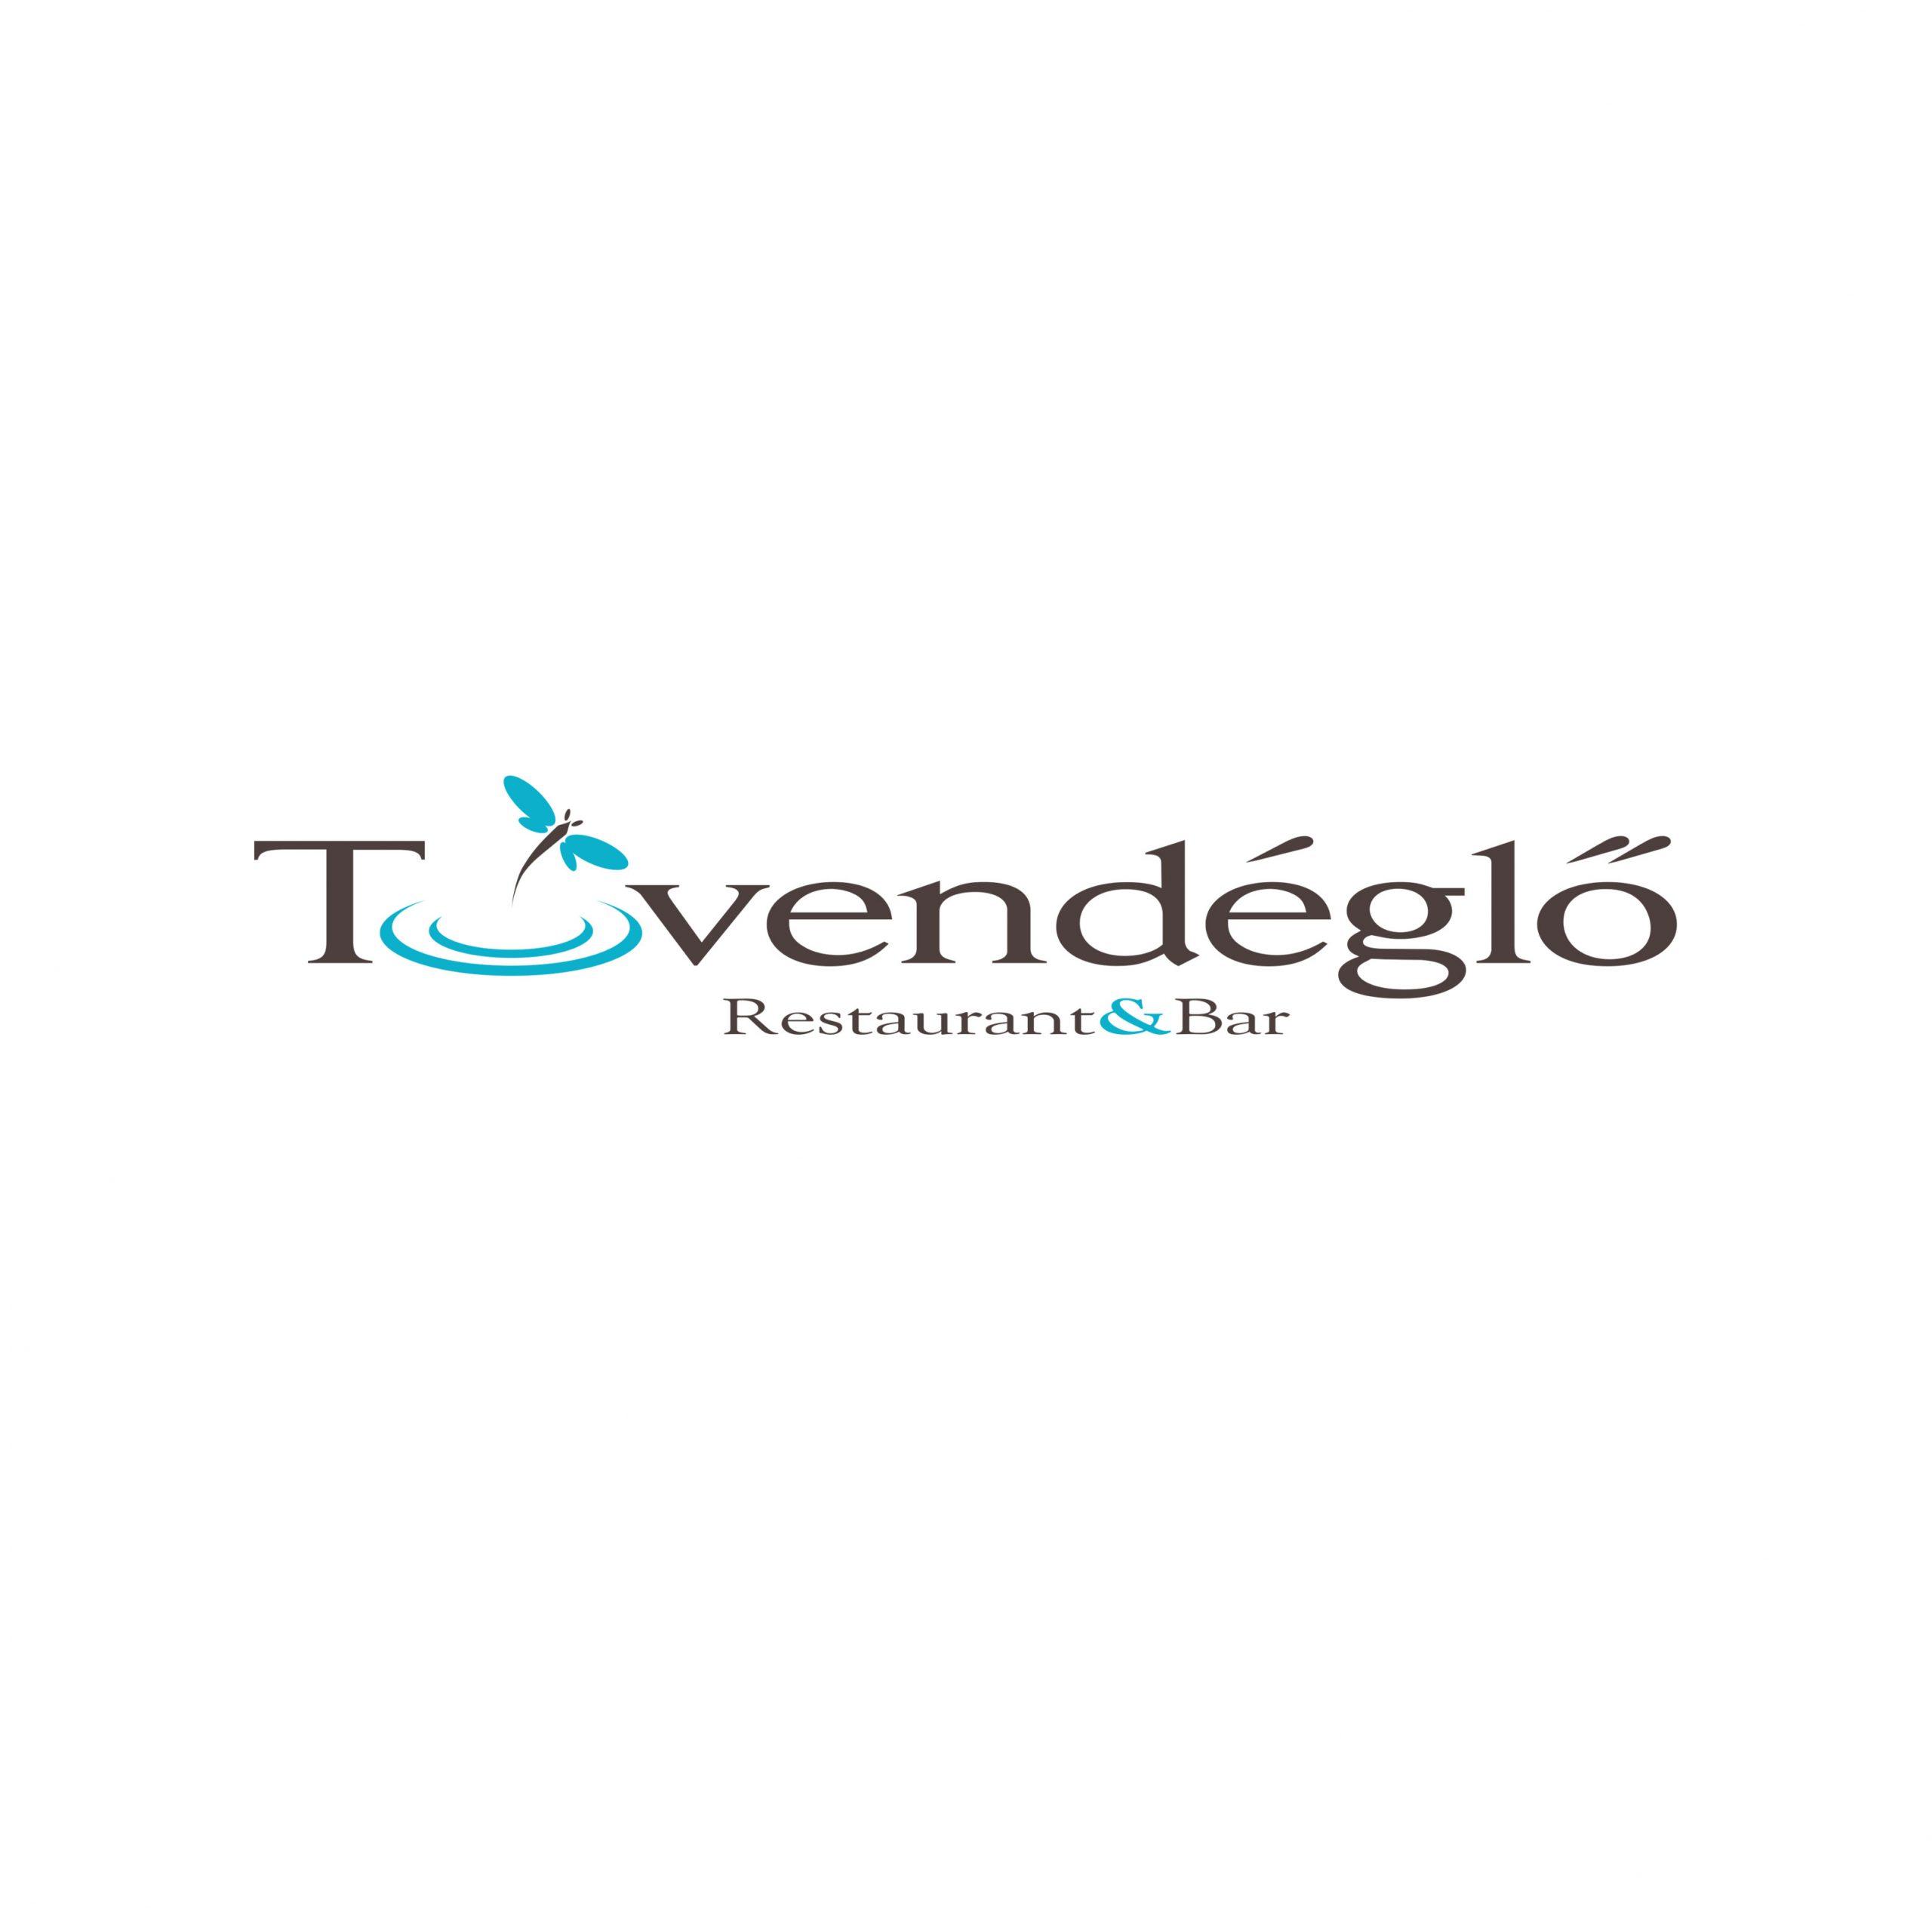 Tóvendéglö logo